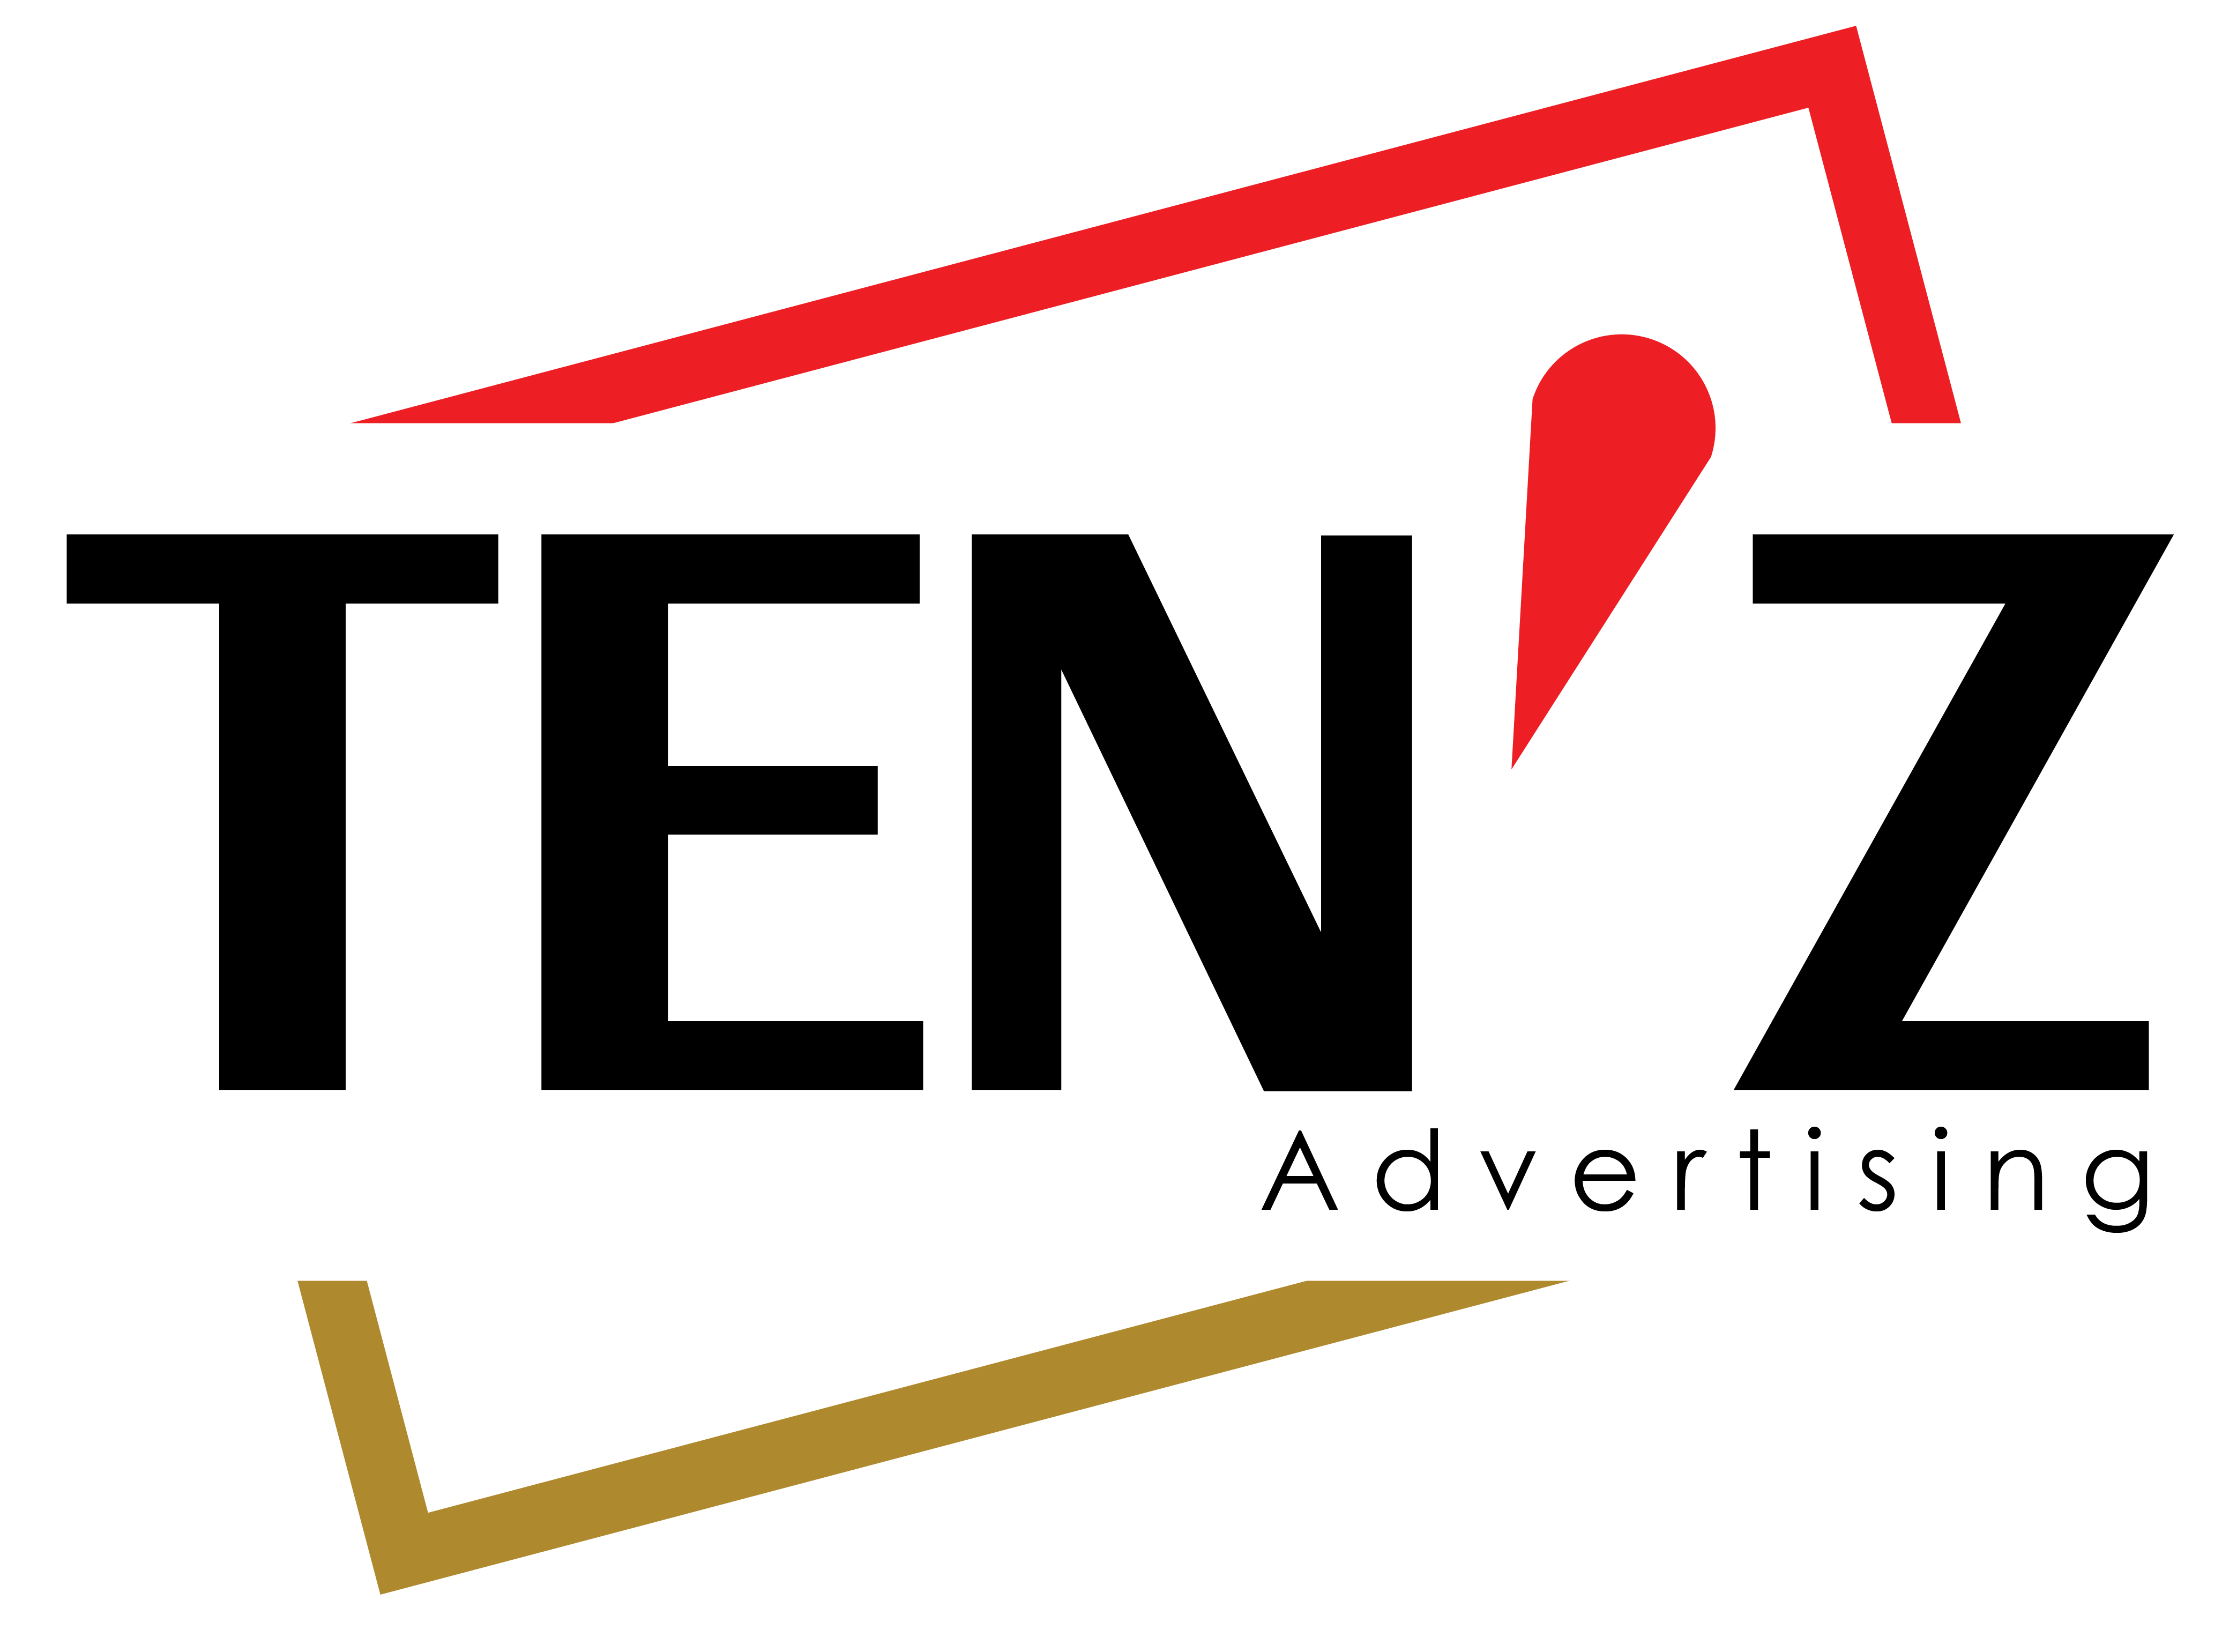 Tenz Advertising